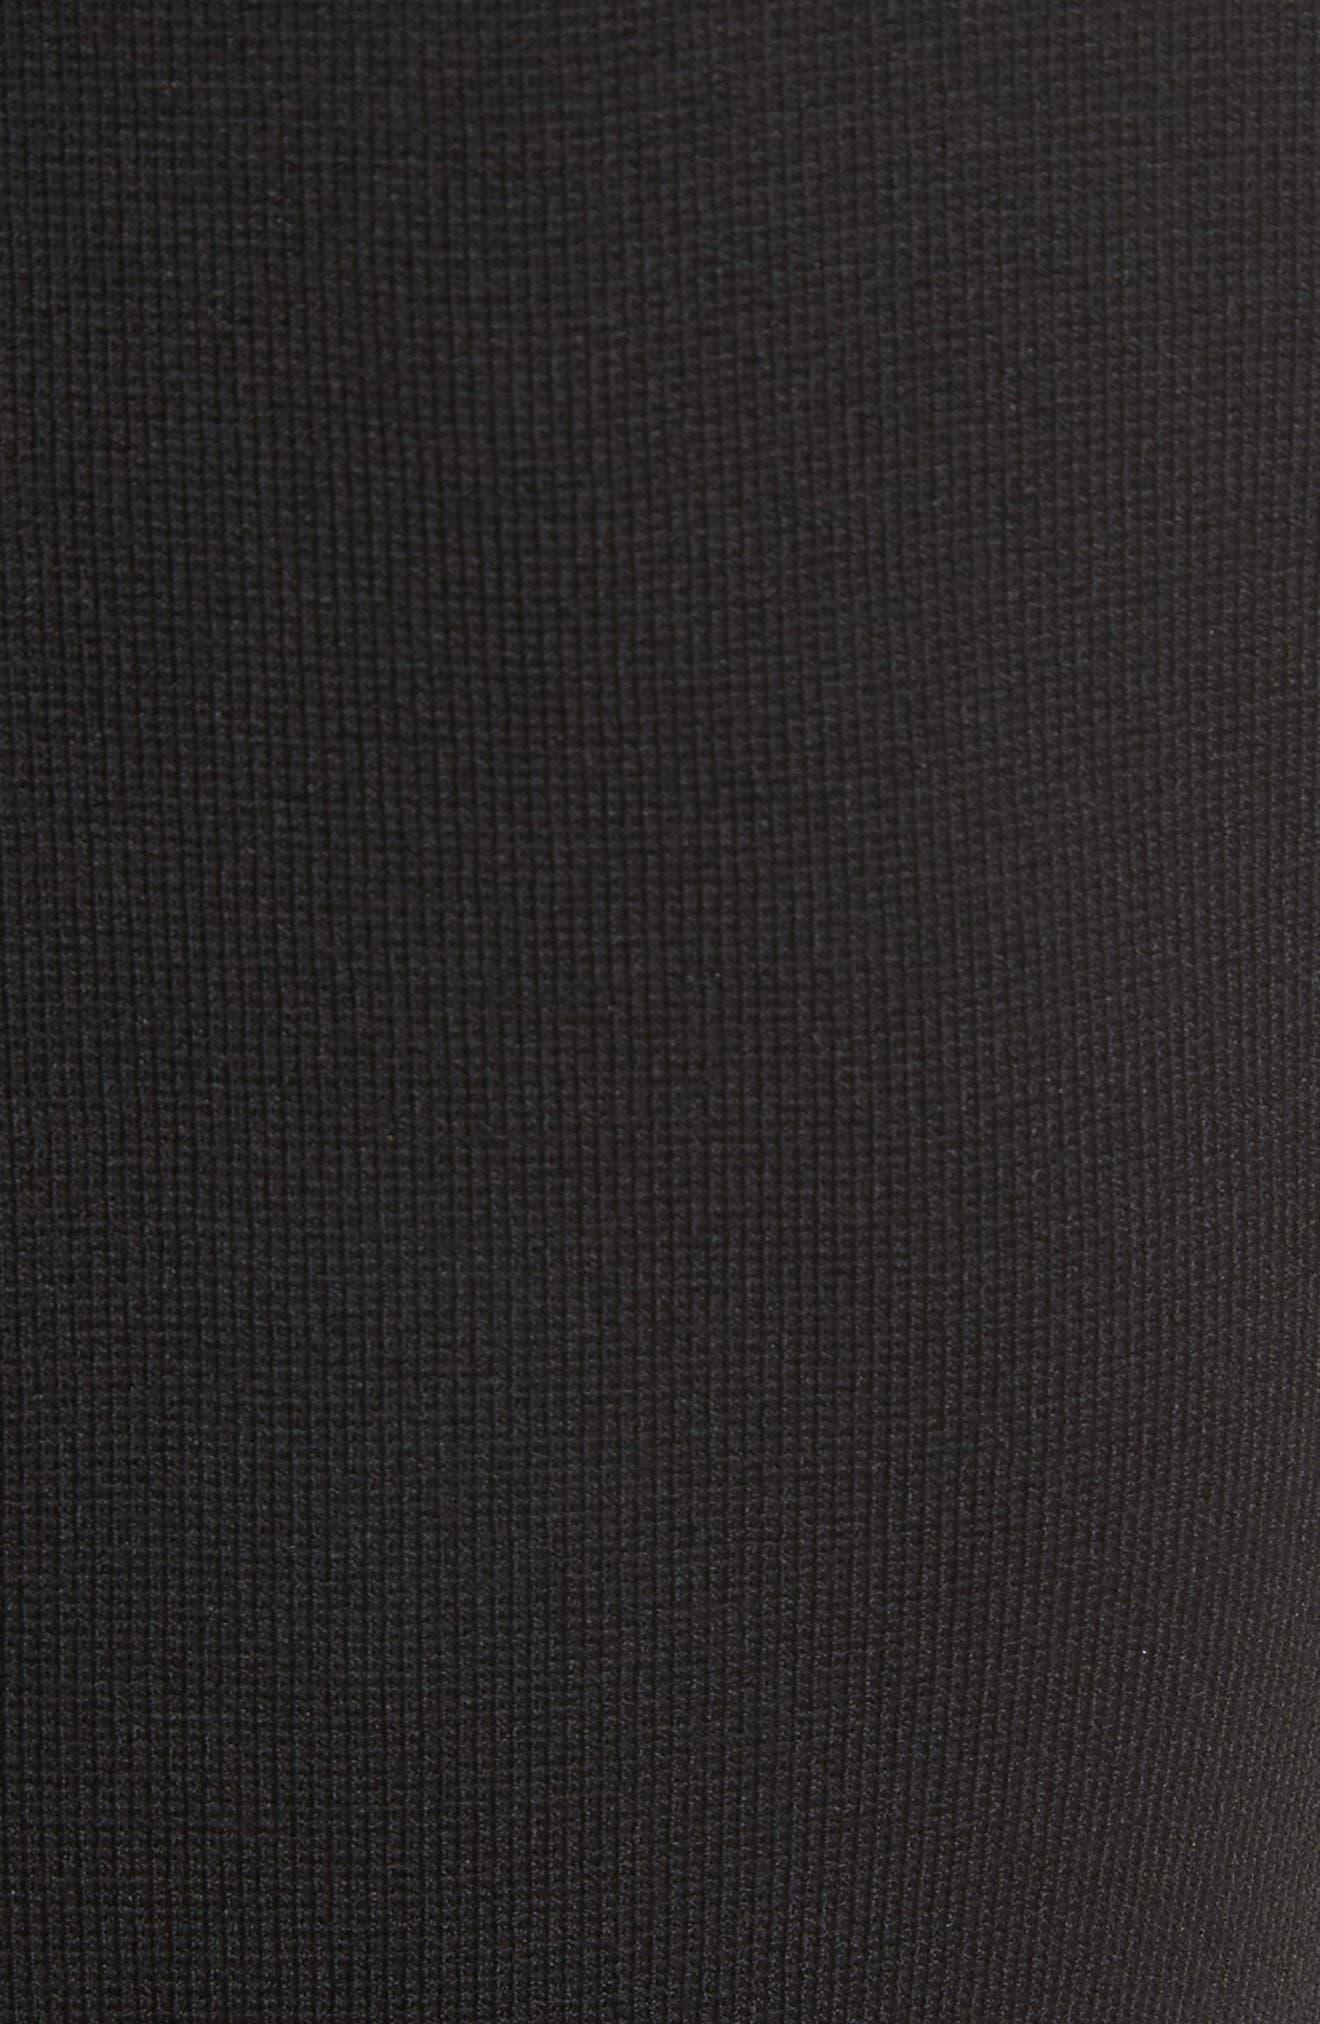 Texture Knit Fit & Flare Dress,                             Alternate thumbnail 5, color,                             001